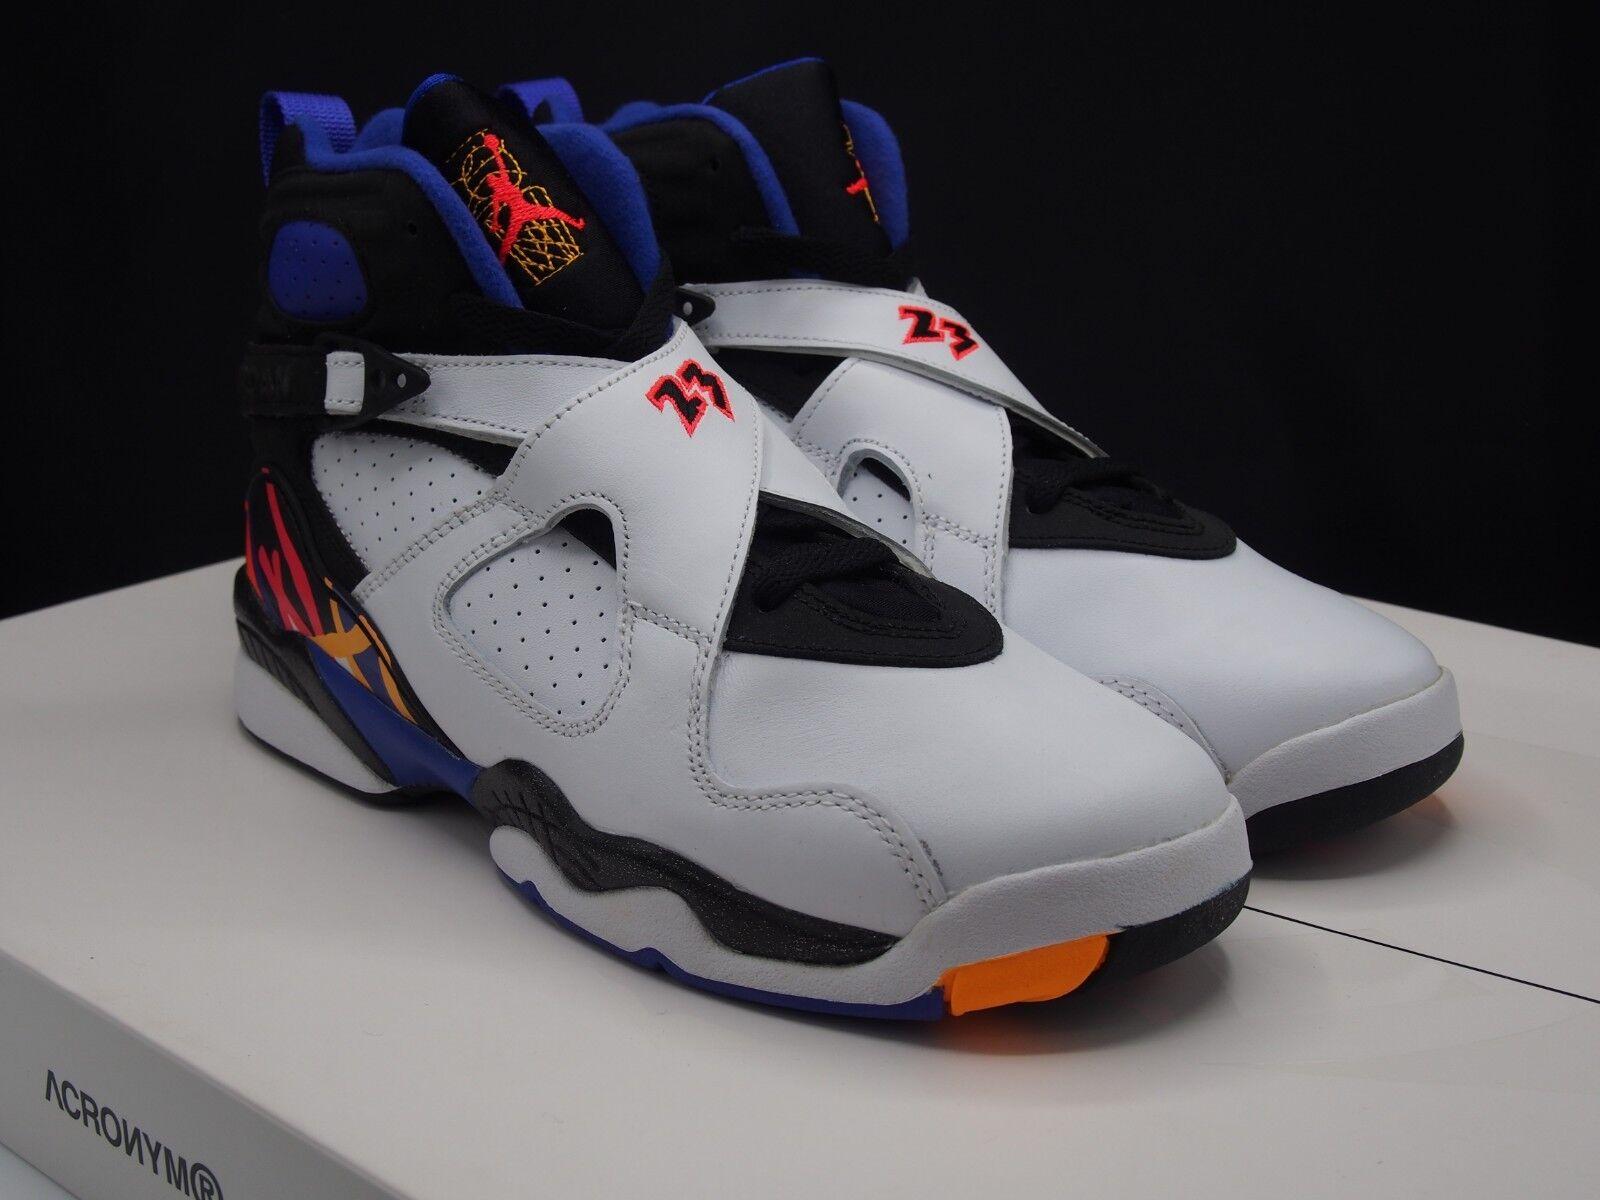 Nike Air Jordan VIII 8 Retro  3 Peat  305368-142